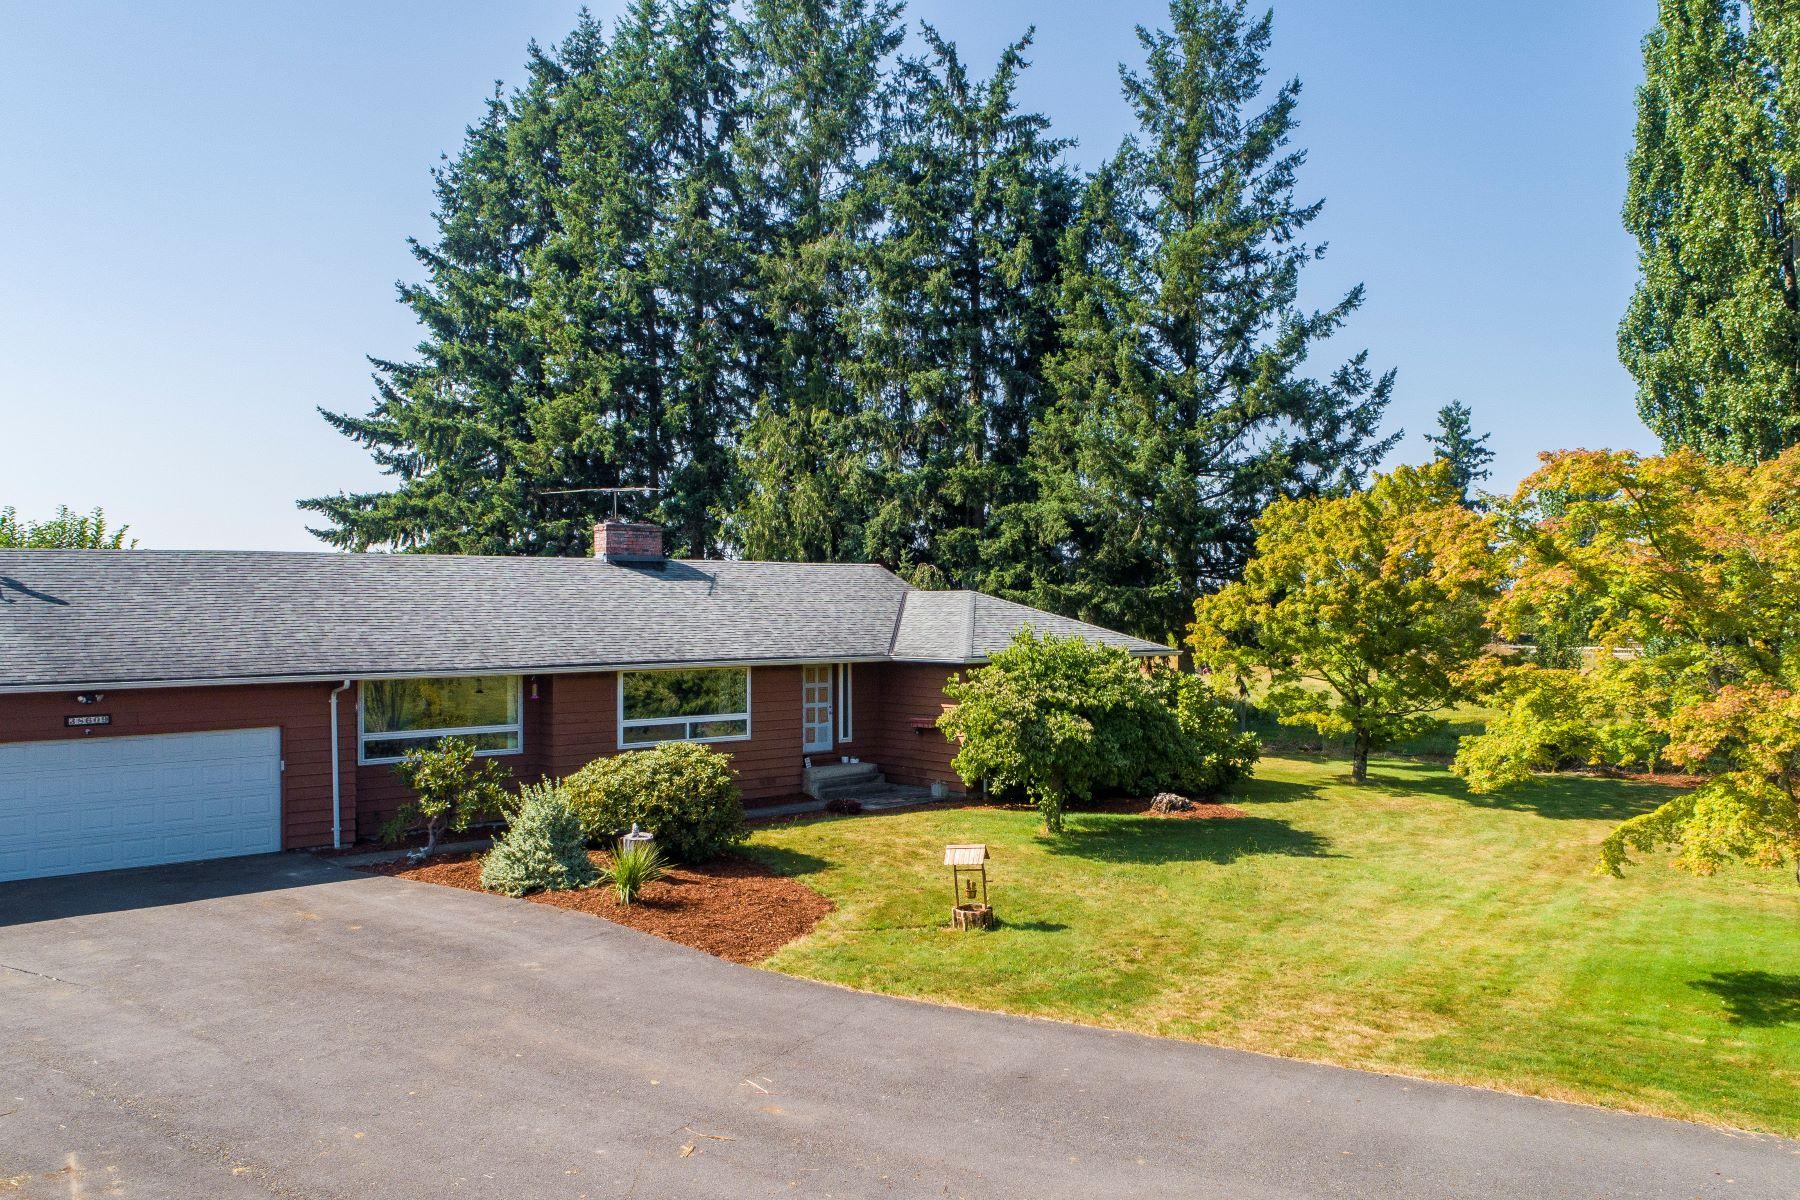 Single Family Homes for Sale at Auburn Acreage 38609 200th Ave SE Auburn, Washington 98092 United States